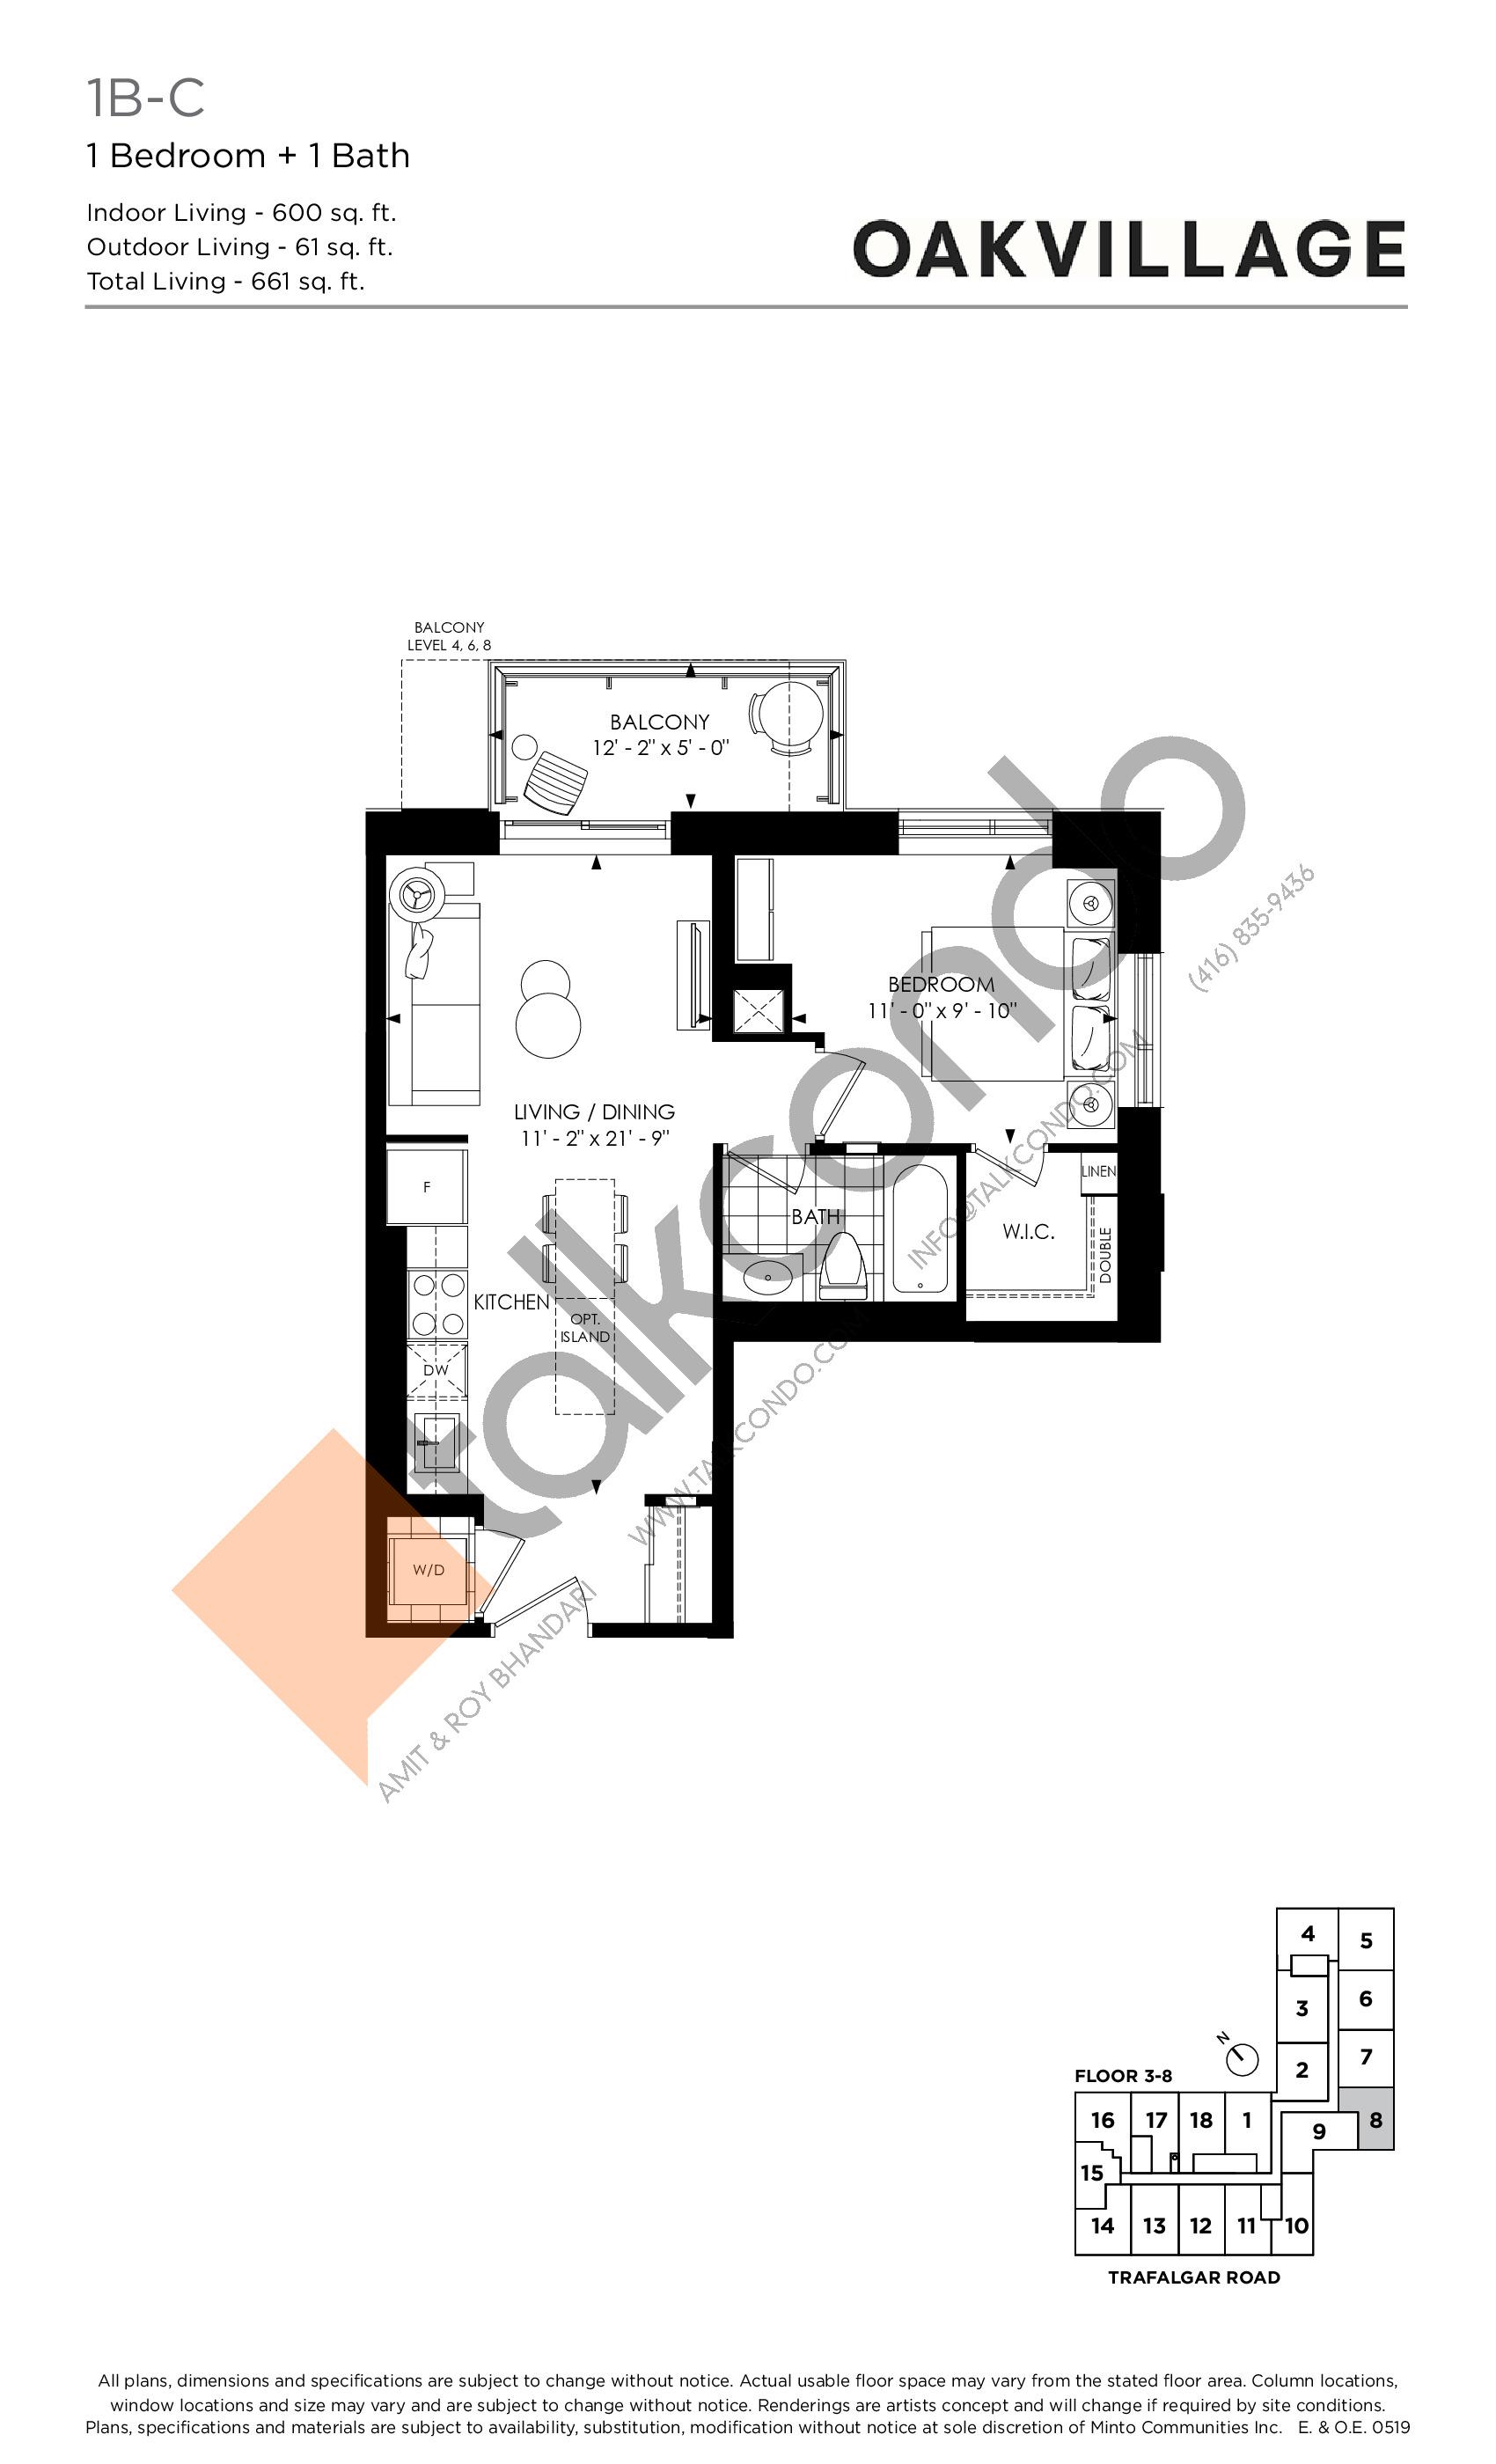 1B-C (Podium) Floor Plan at Oakvillage Phase 2 - 600 sq.ft